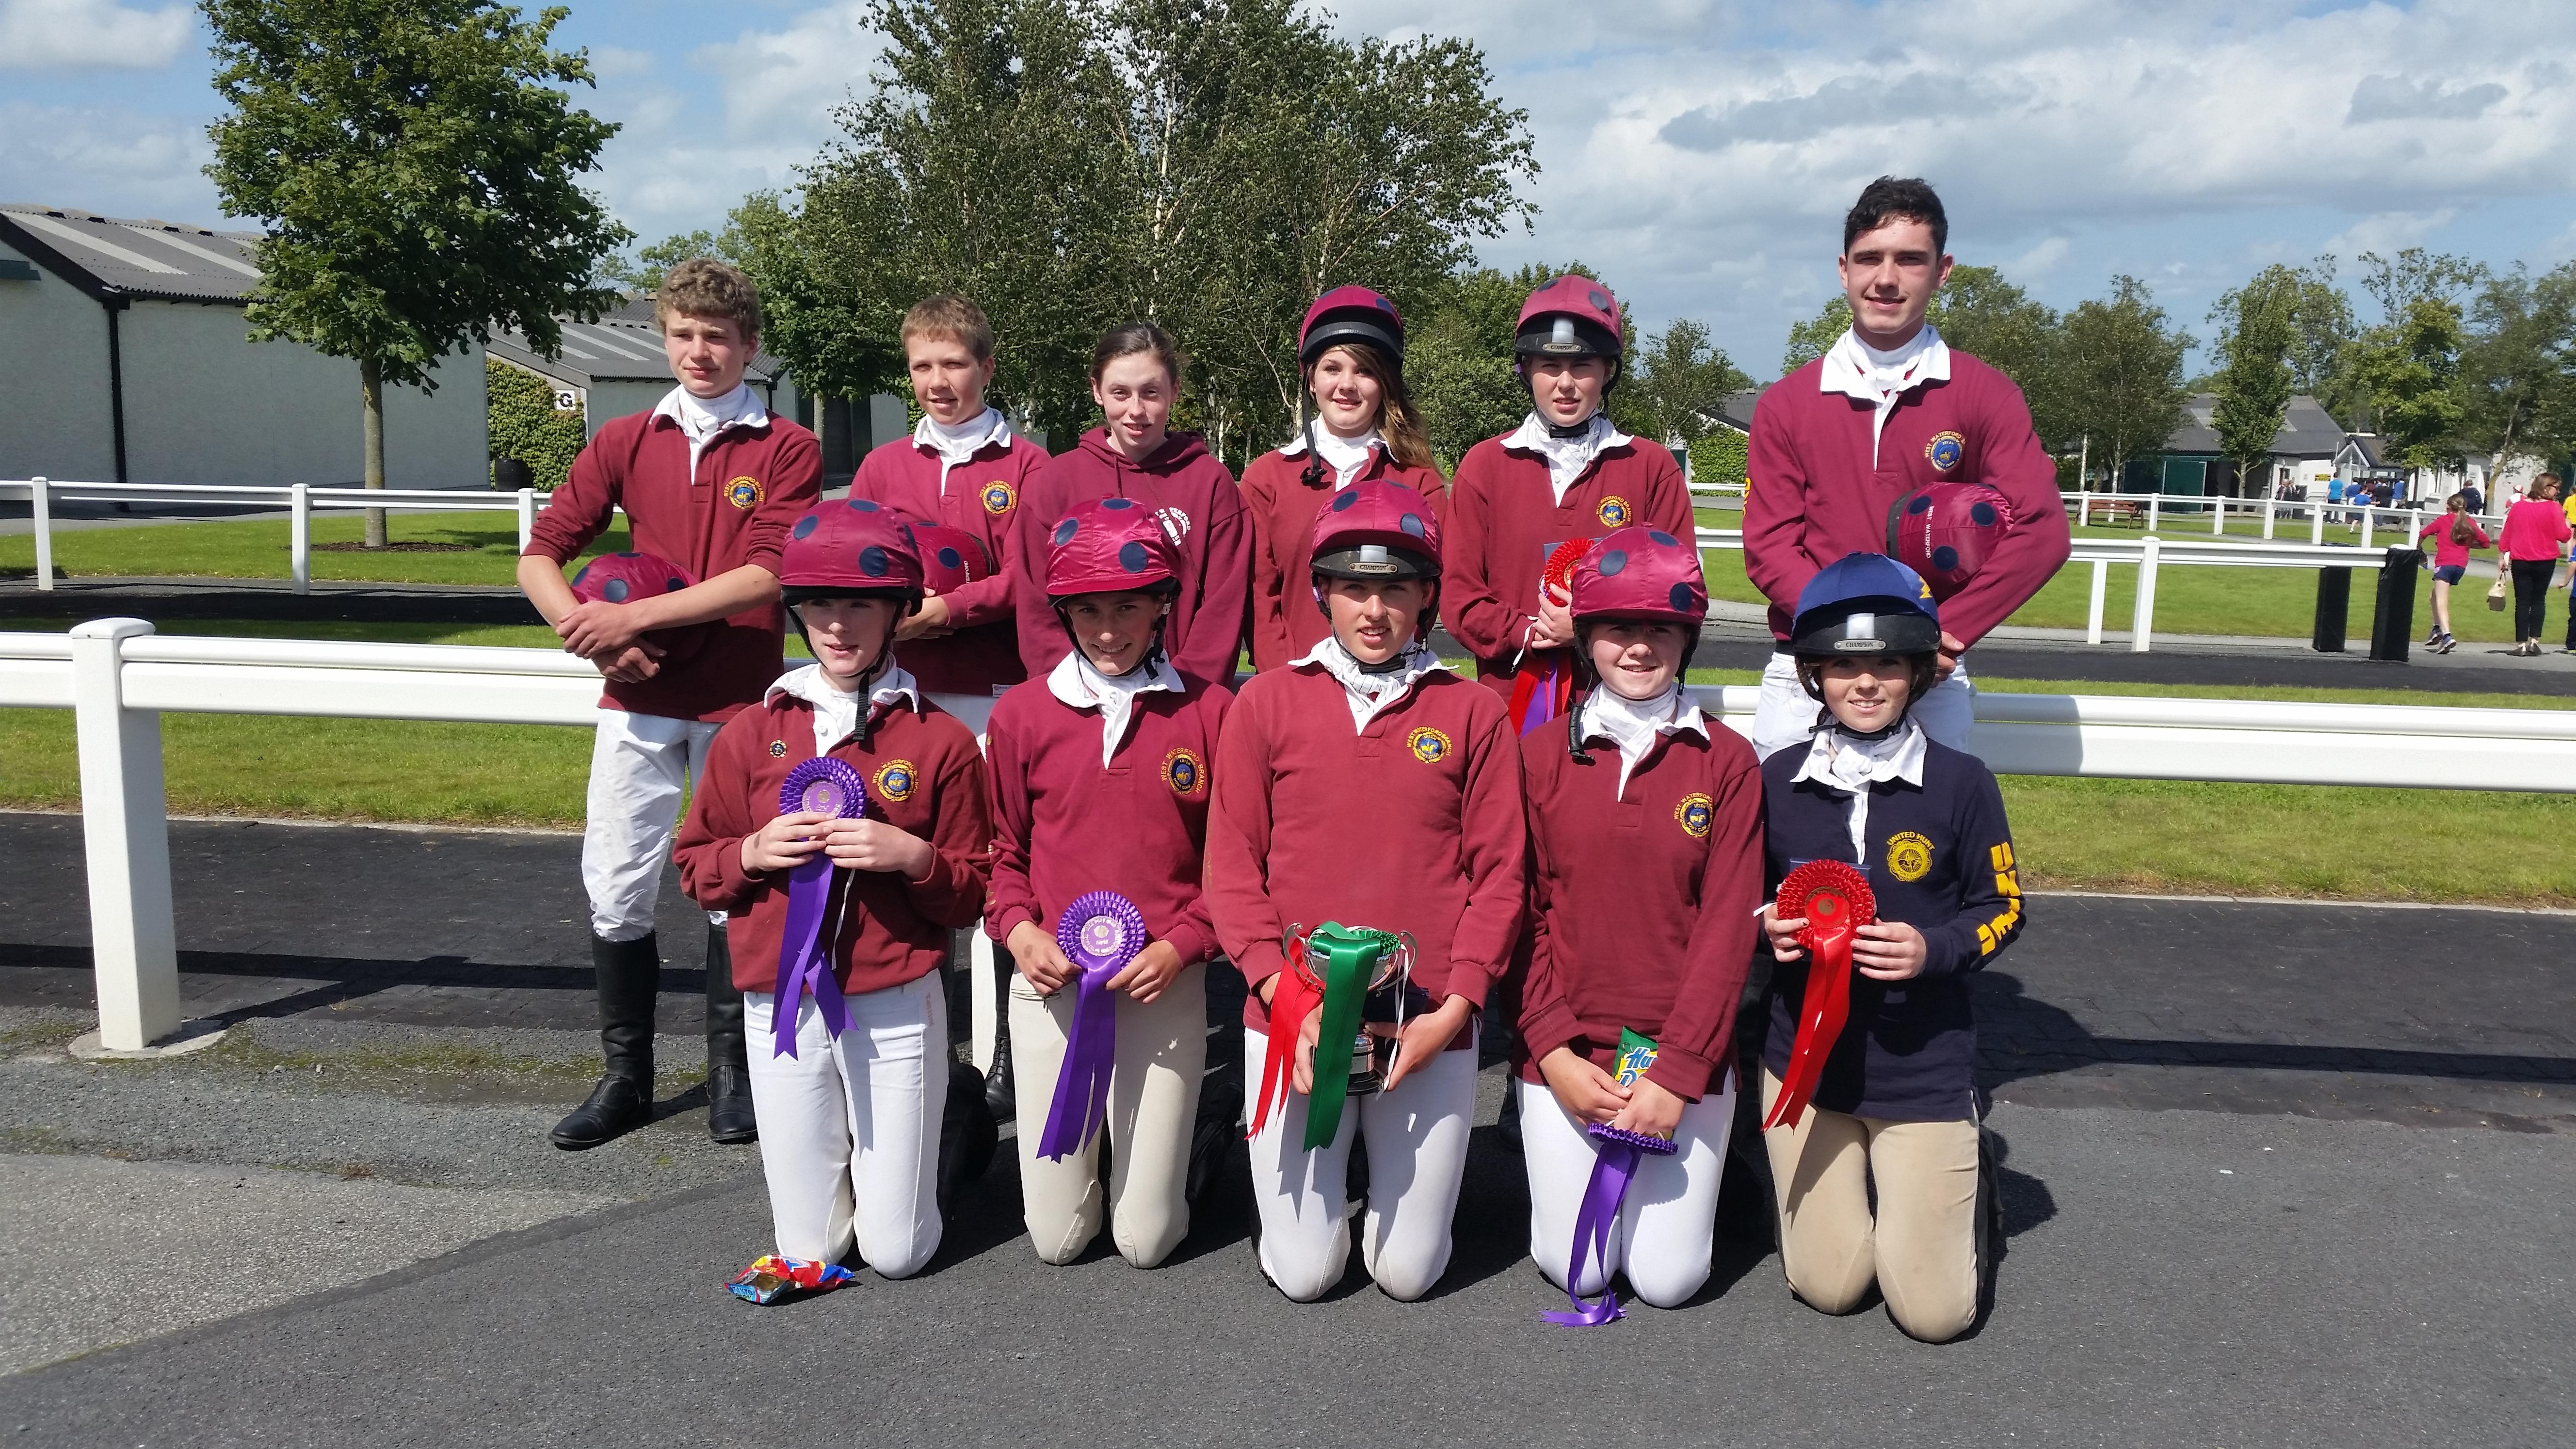 West Waterford members at the tetrathlon 2015